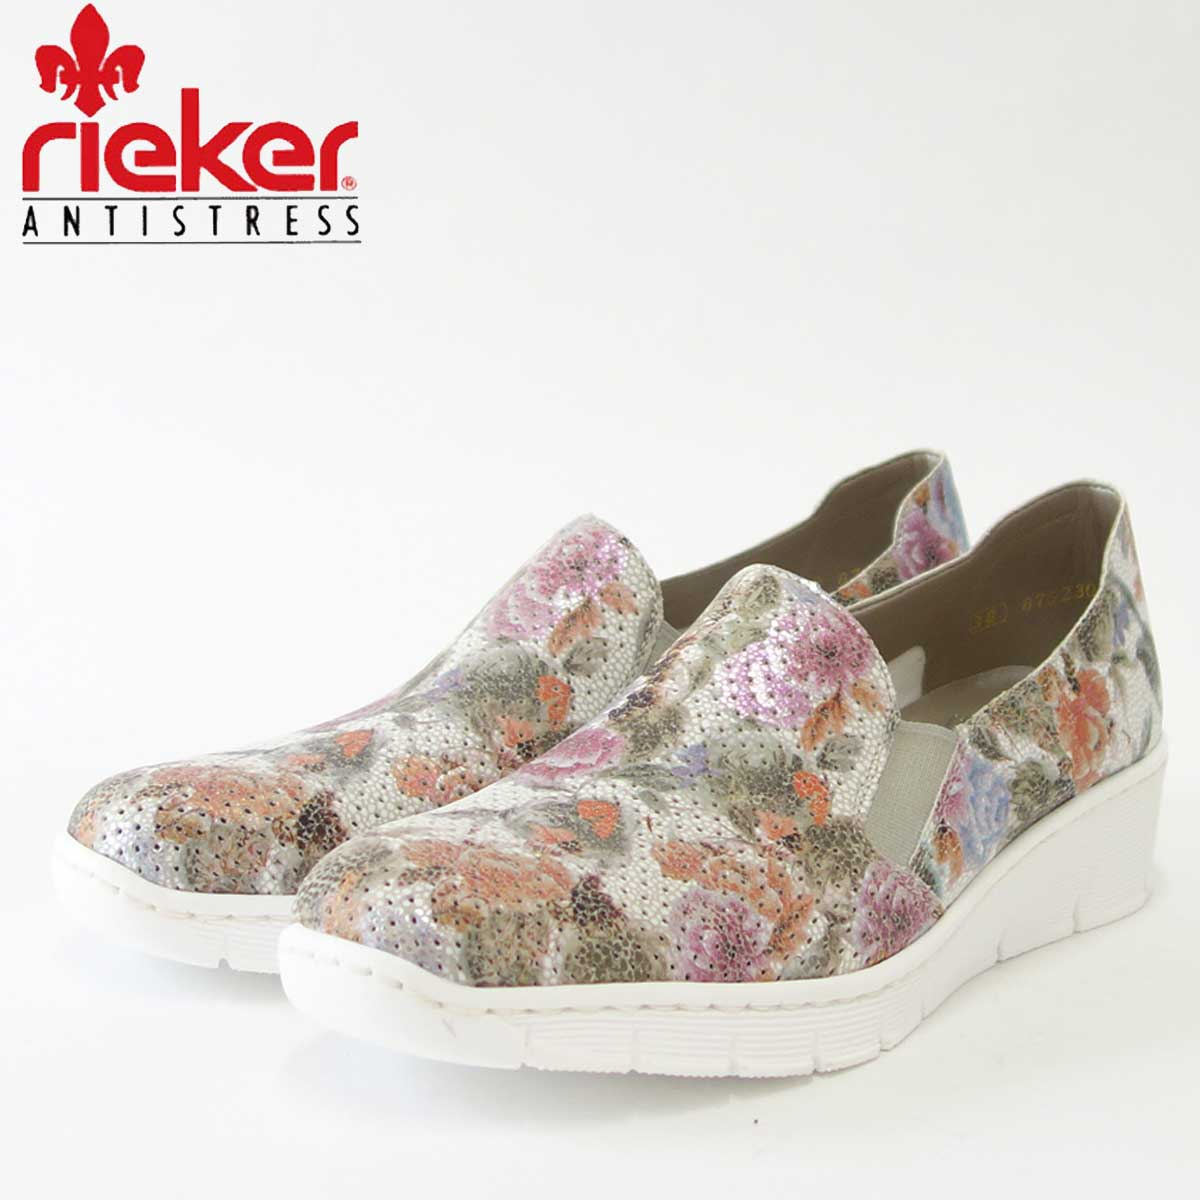 rieker リーカー 537A5-90 マルチ(レディース)クッション性の良いお洒落スリッポンシューズ「靴」